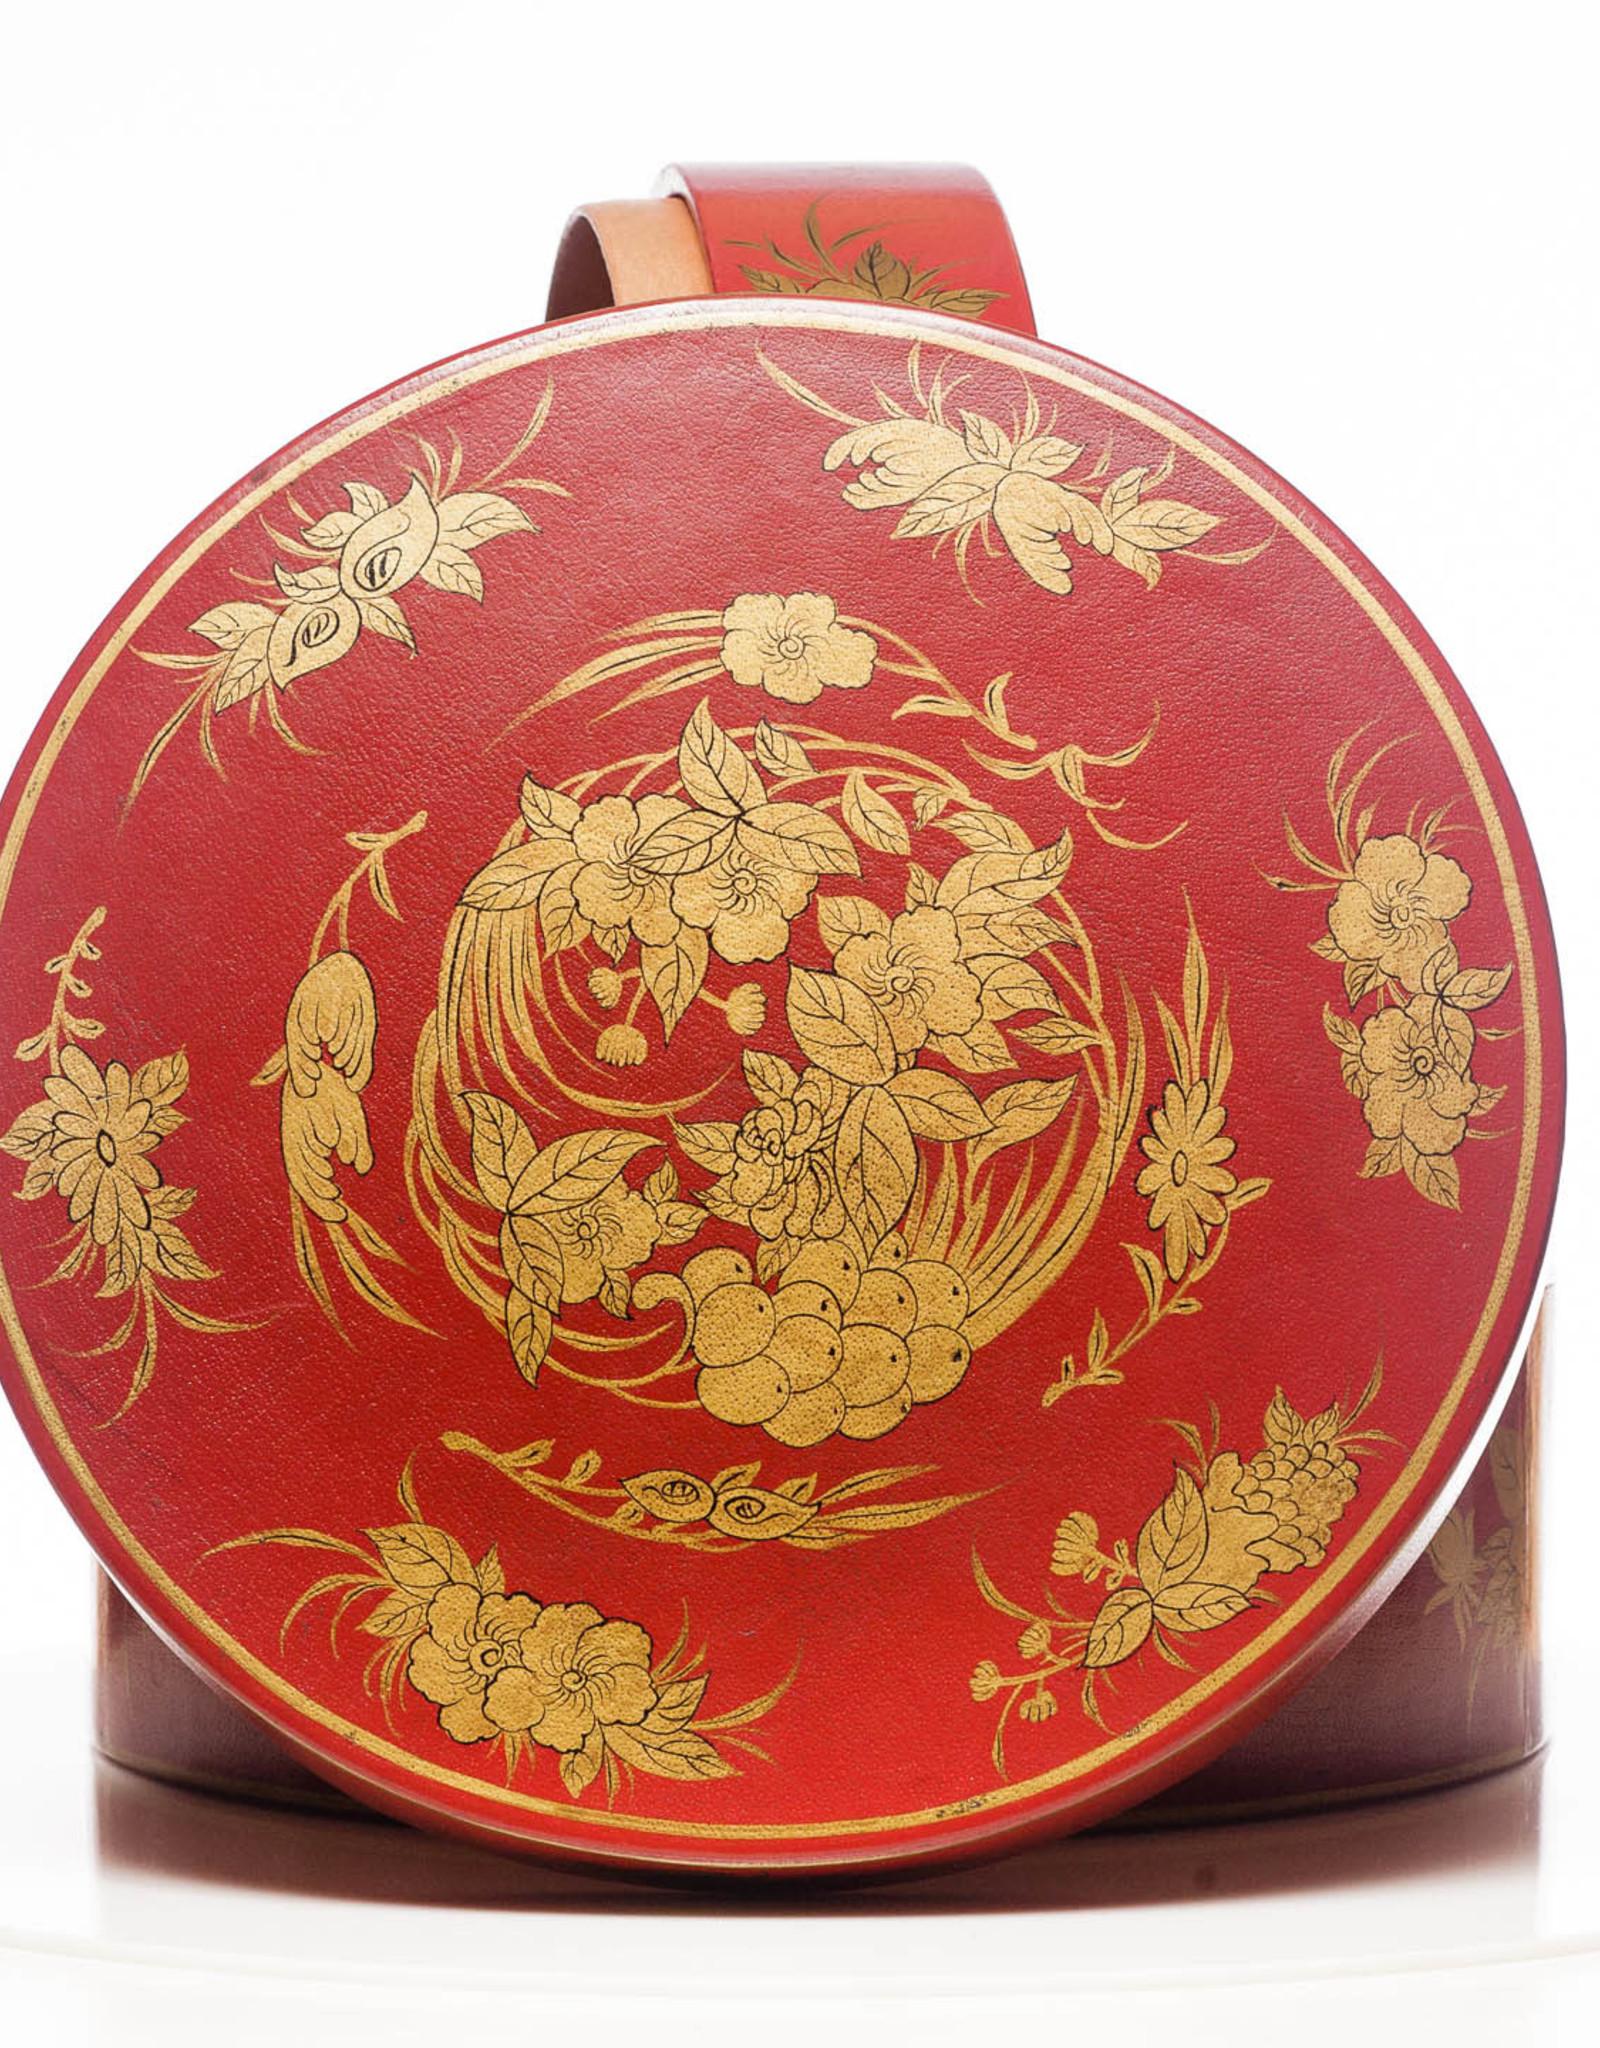 "Lawrence & Scott Mandarin Red Nurture 2-Tier Round Leather Sewing Box (14"")"